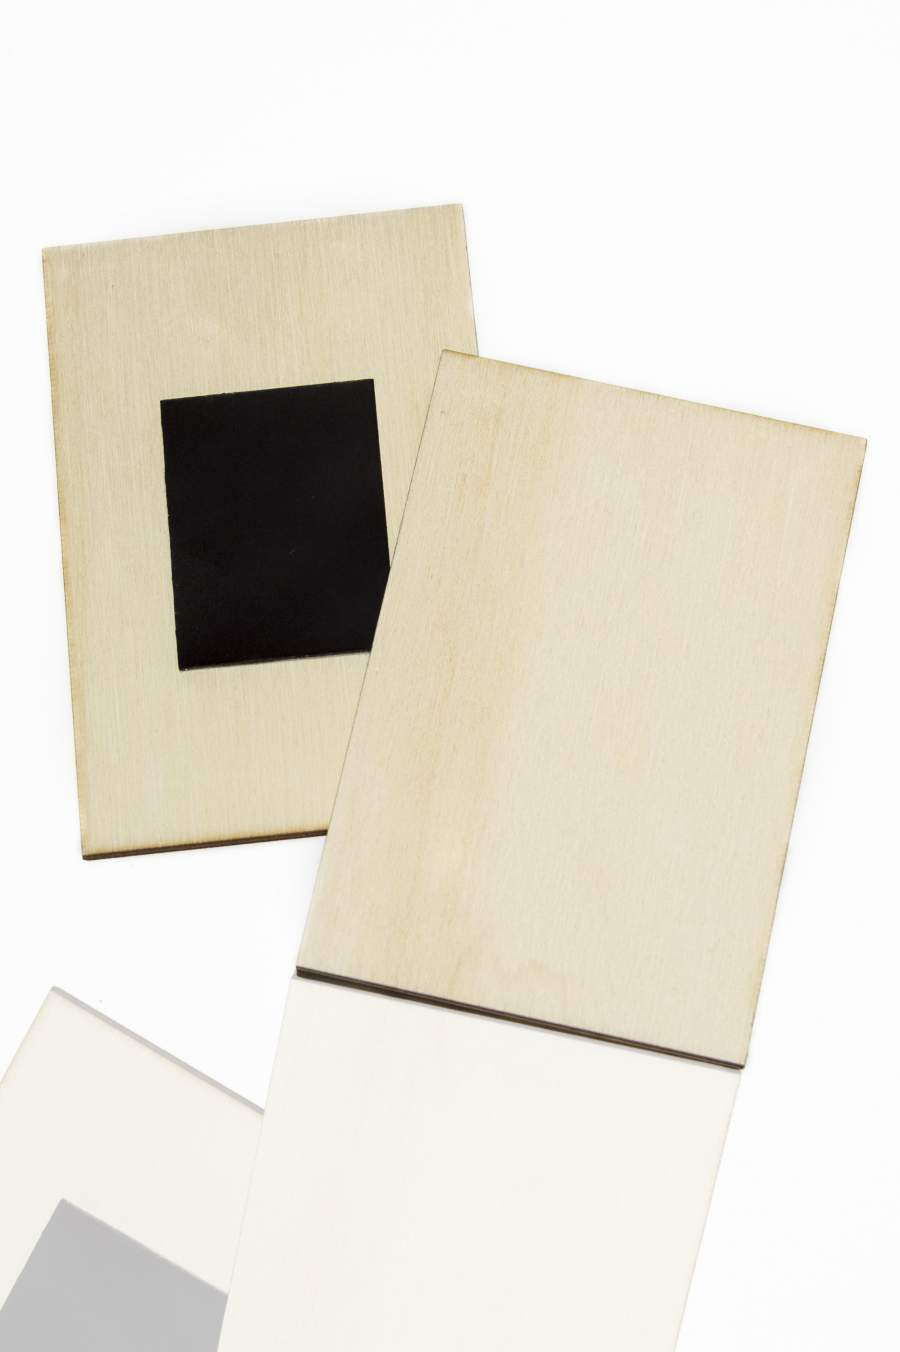 102.1 Drevená magnetka na chladničku – základný materiál 60x45mm